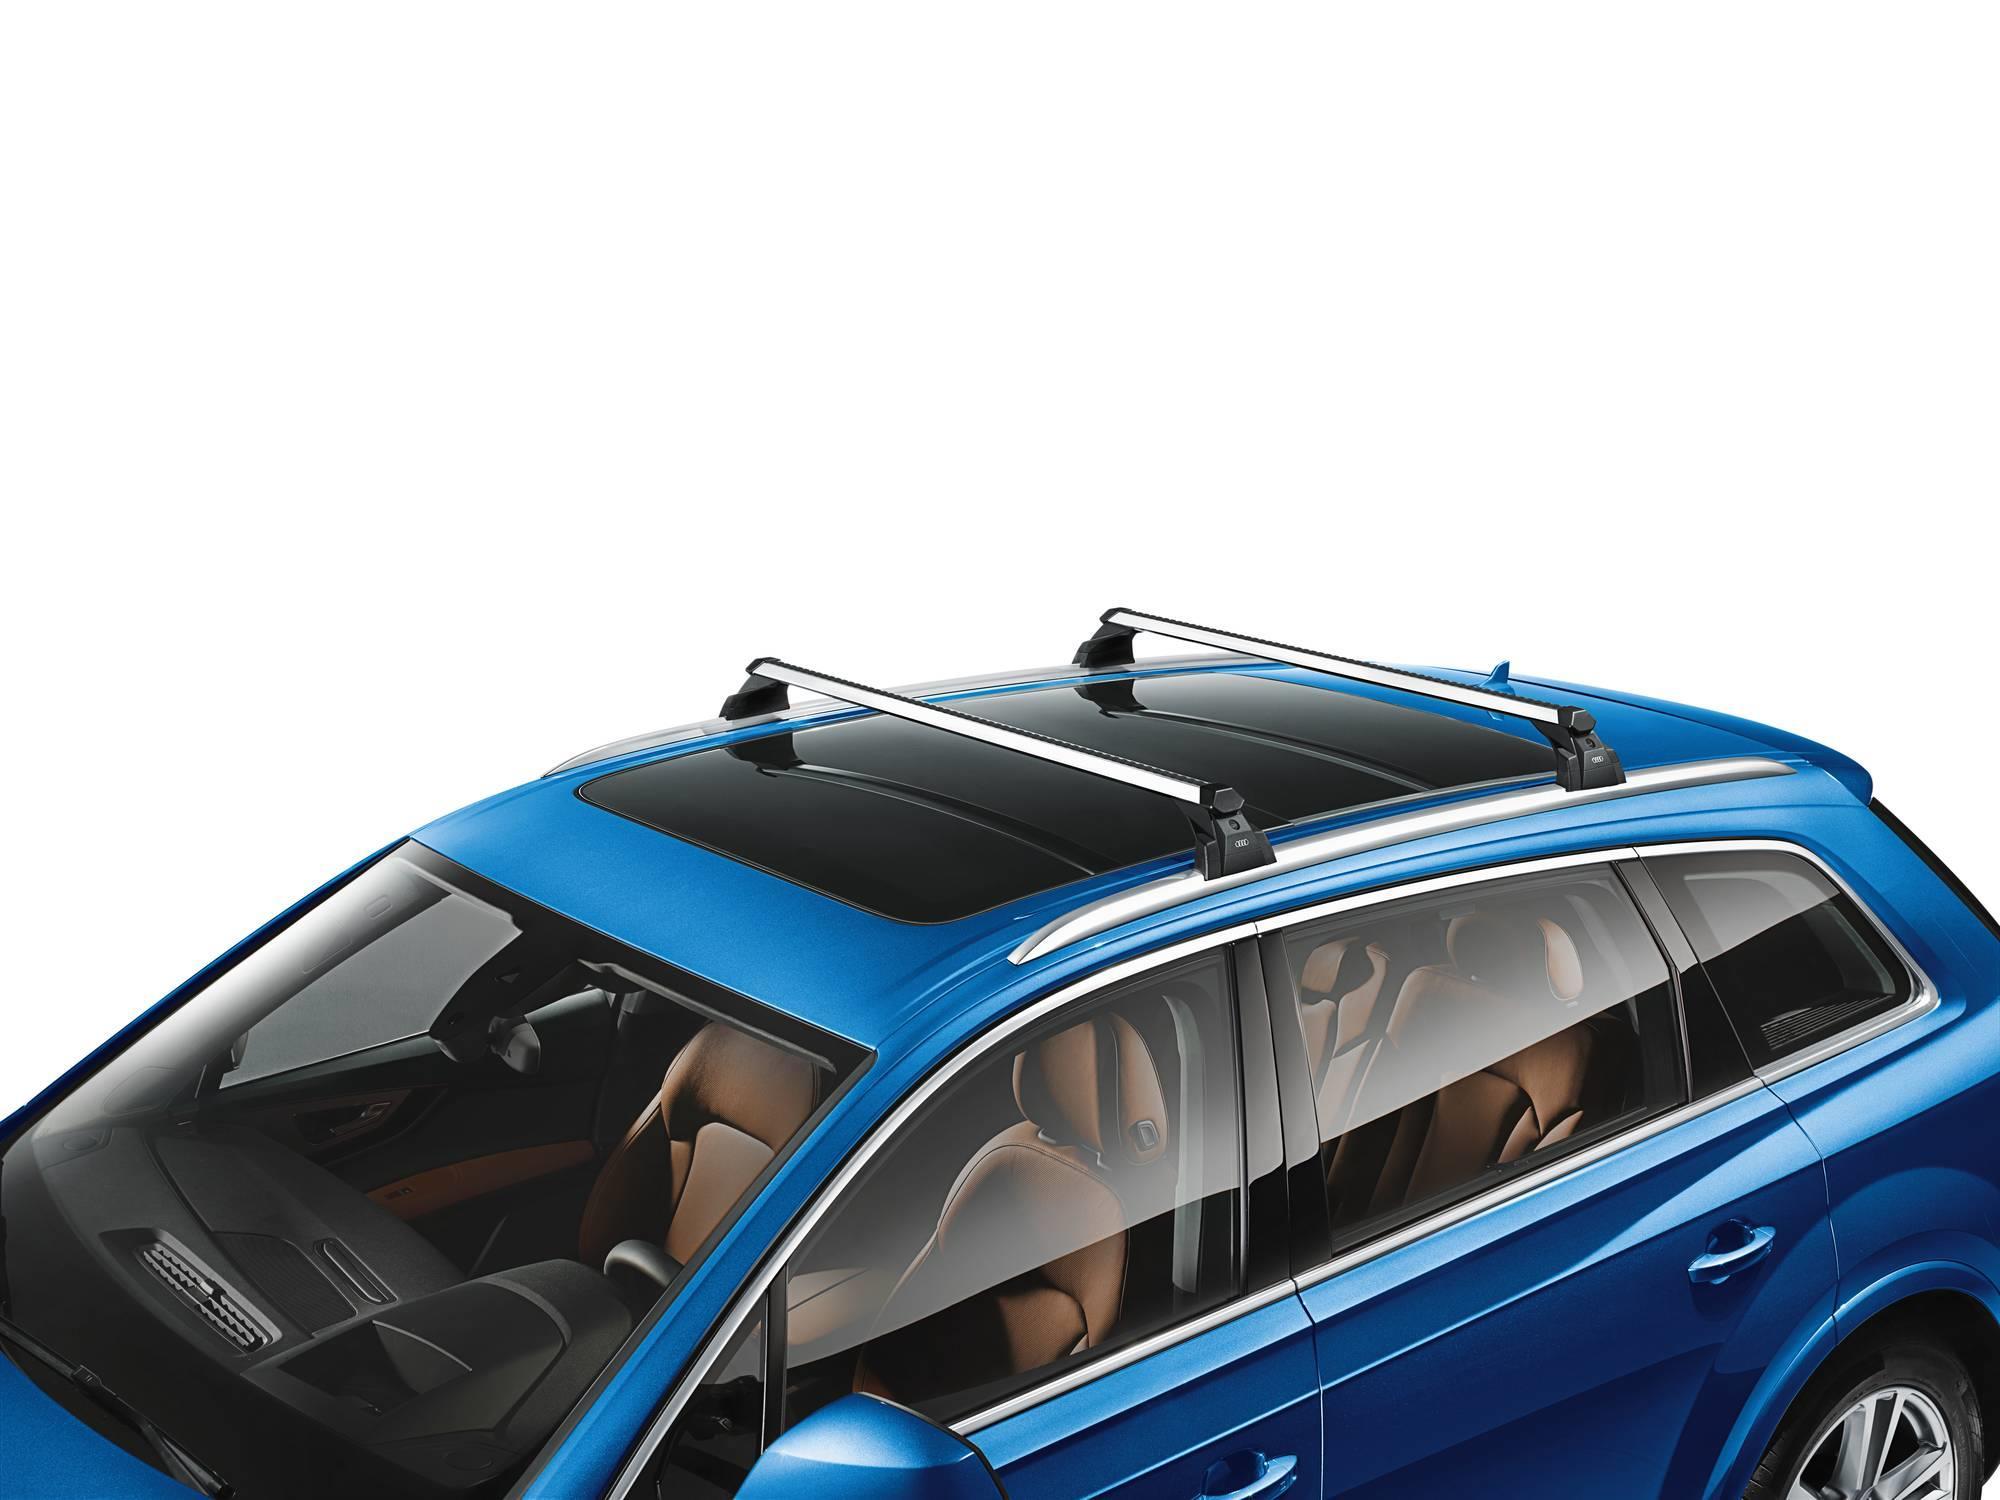 2018 Audi Q7 Base Carrier Bars Ensure Highquality Racks